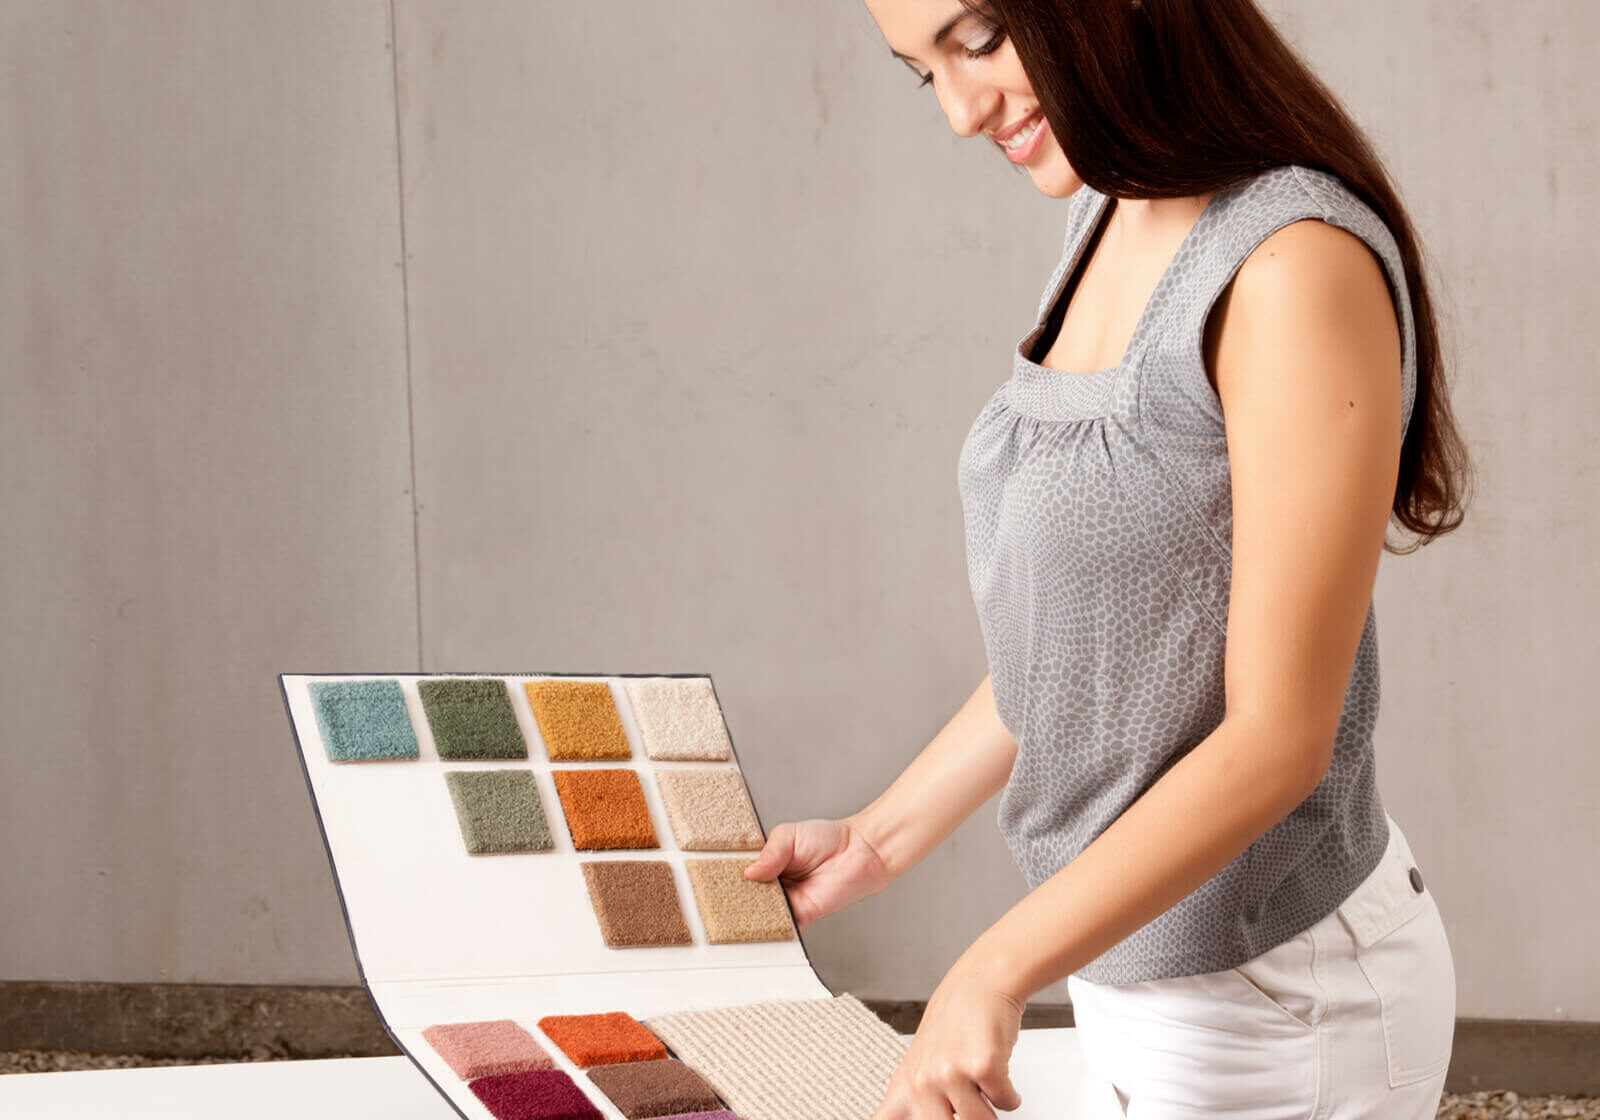 Shop at home | Kopp's Carpet & Decorating